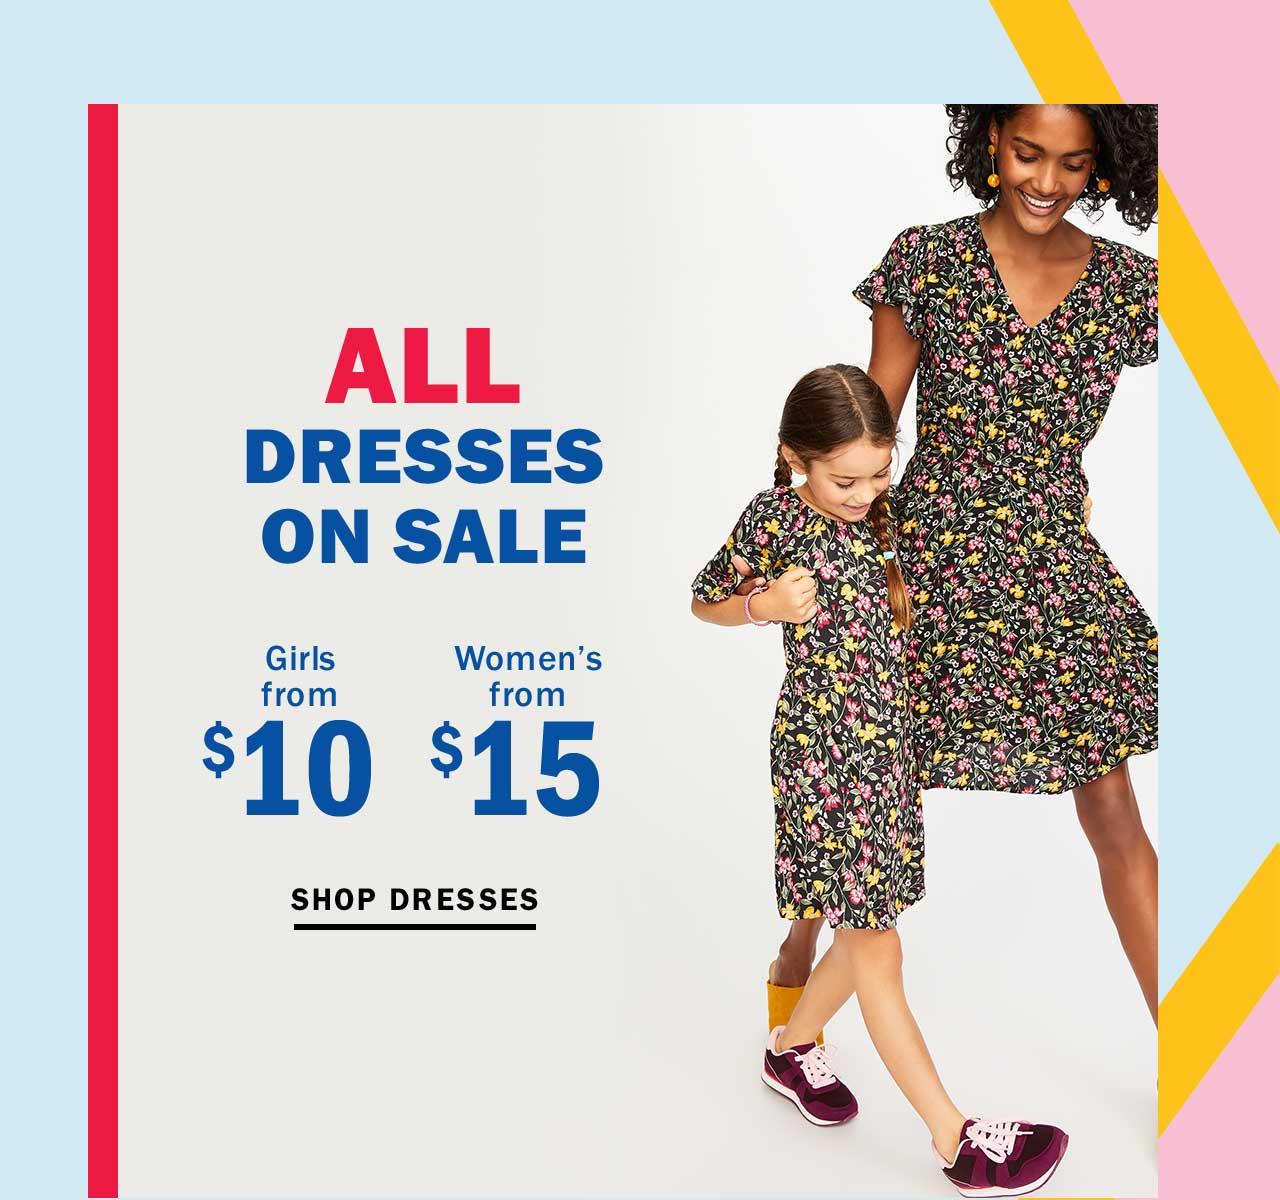 ALL DRESSES ON SALE   SHOP DRESSES